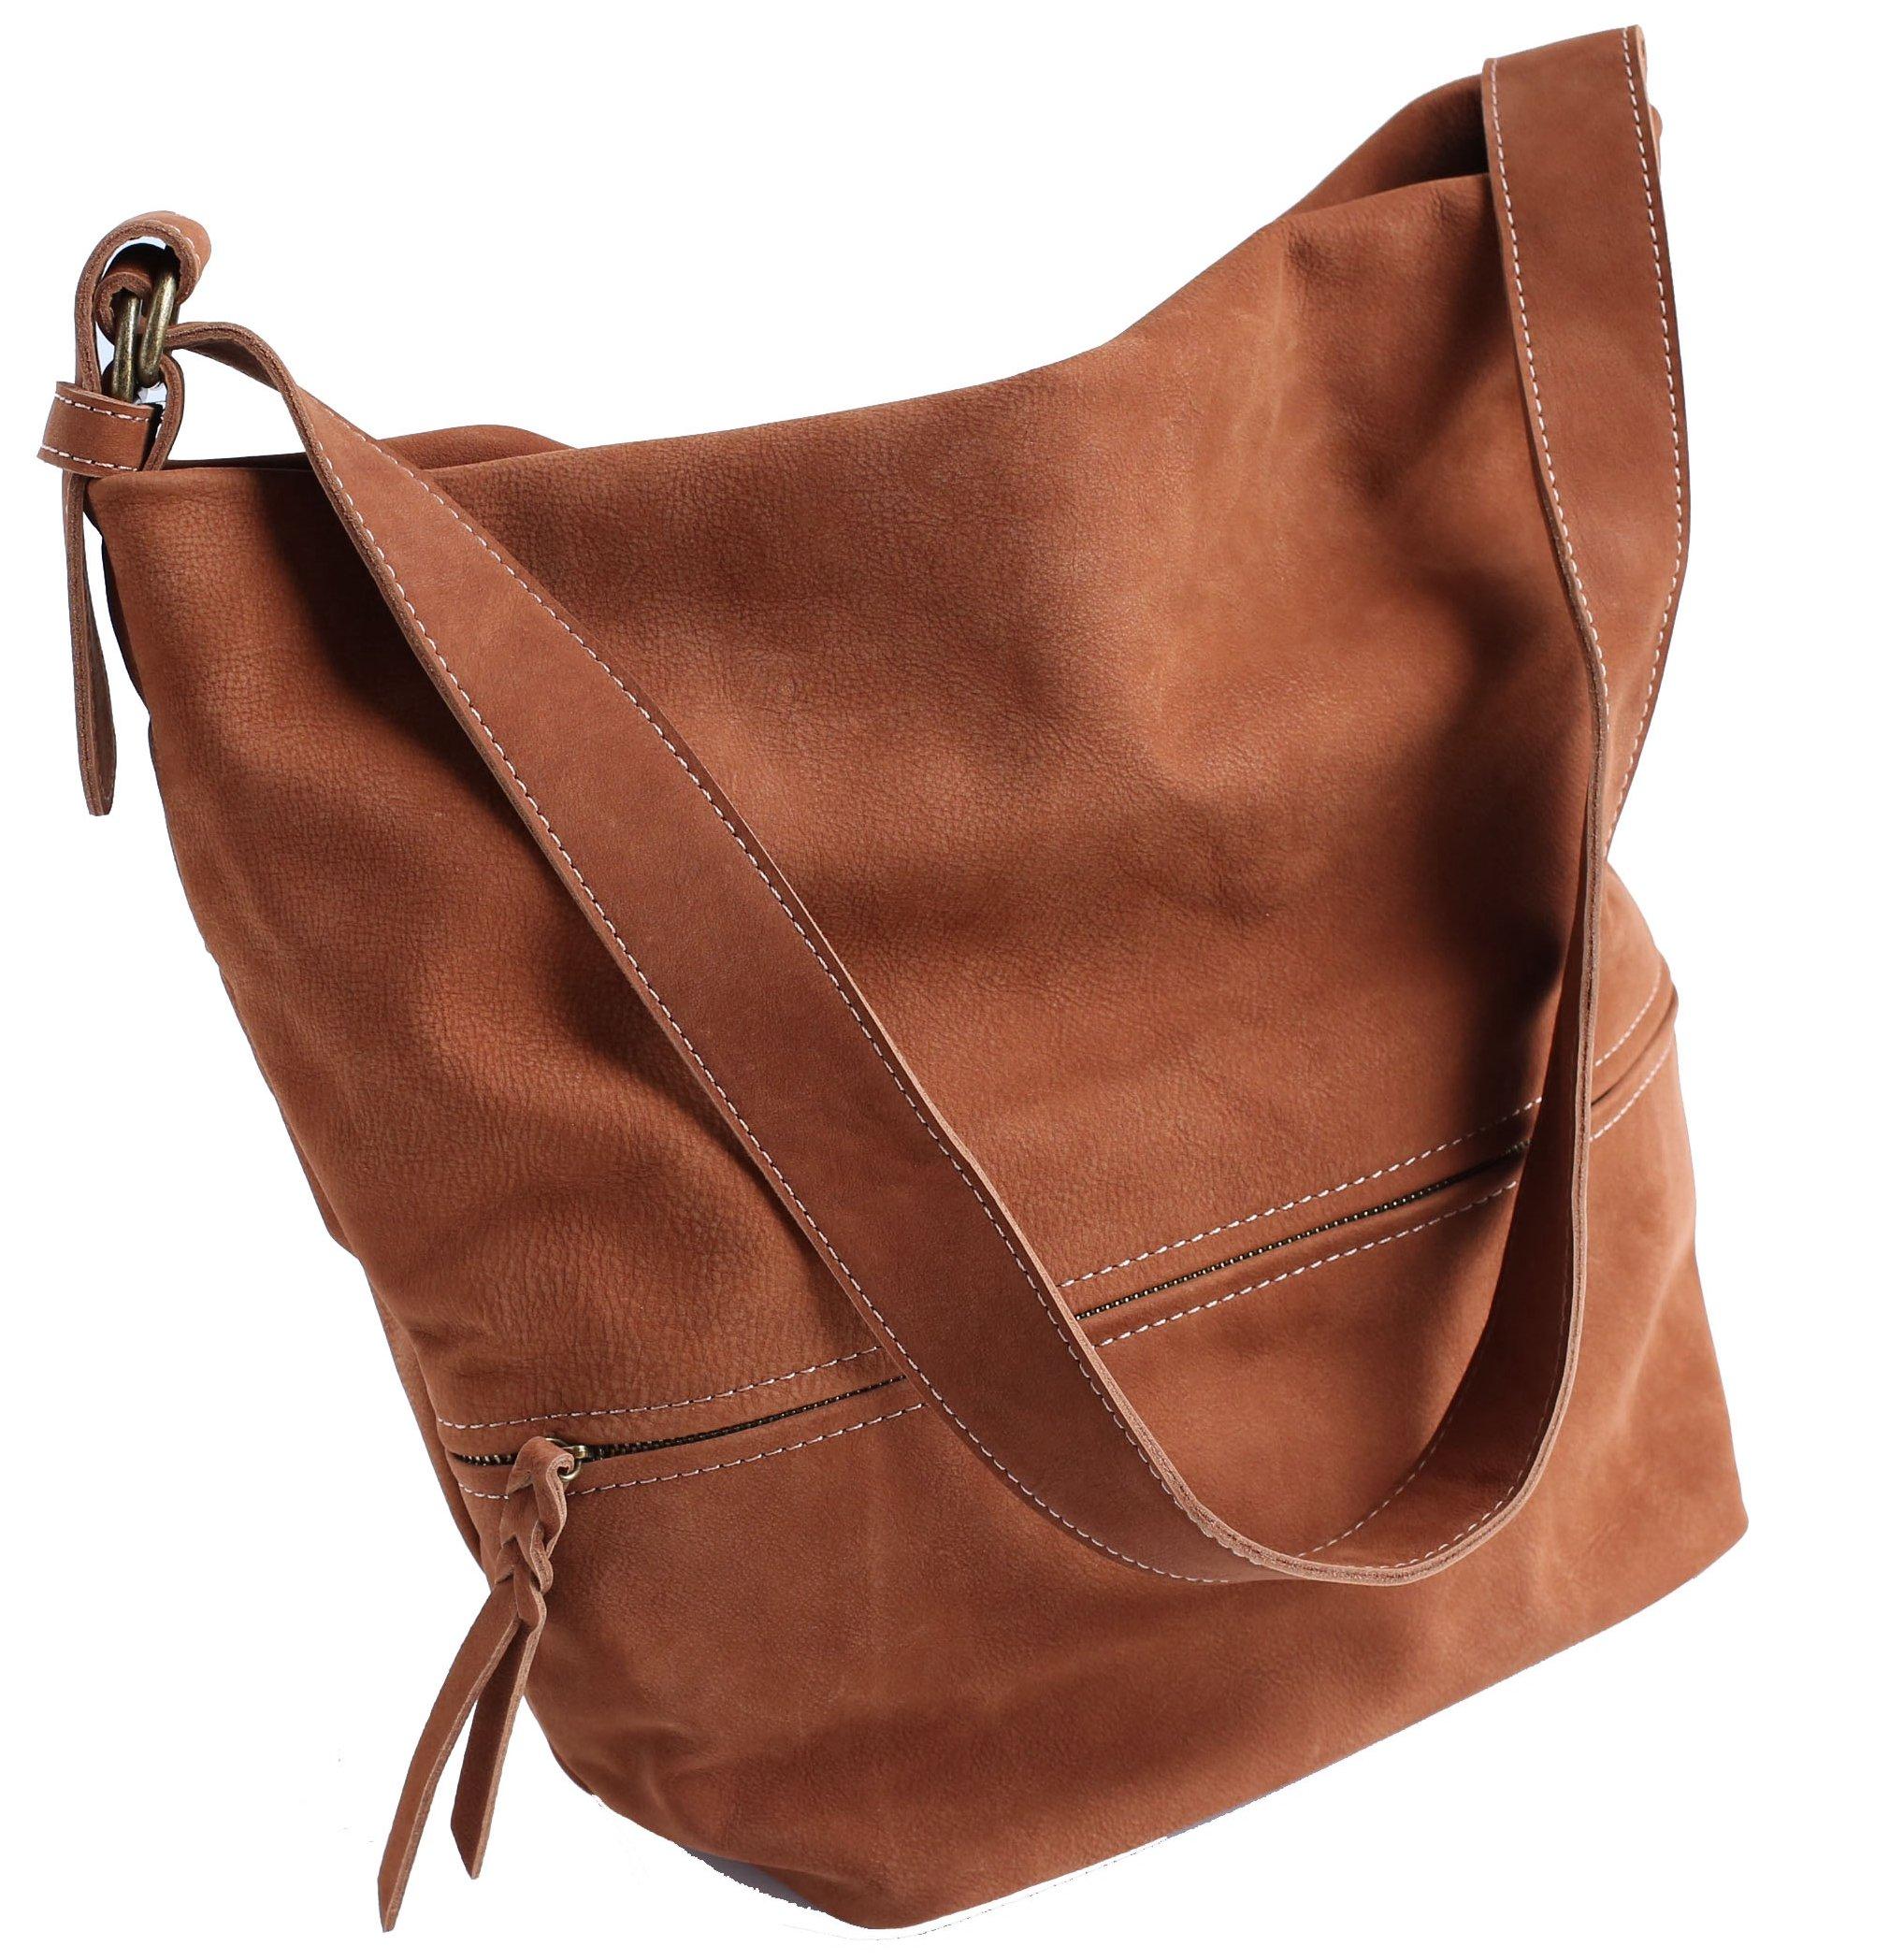 Vendange original design simple retro leather bucket bag short oblique cross bag handbag lady bag 2264